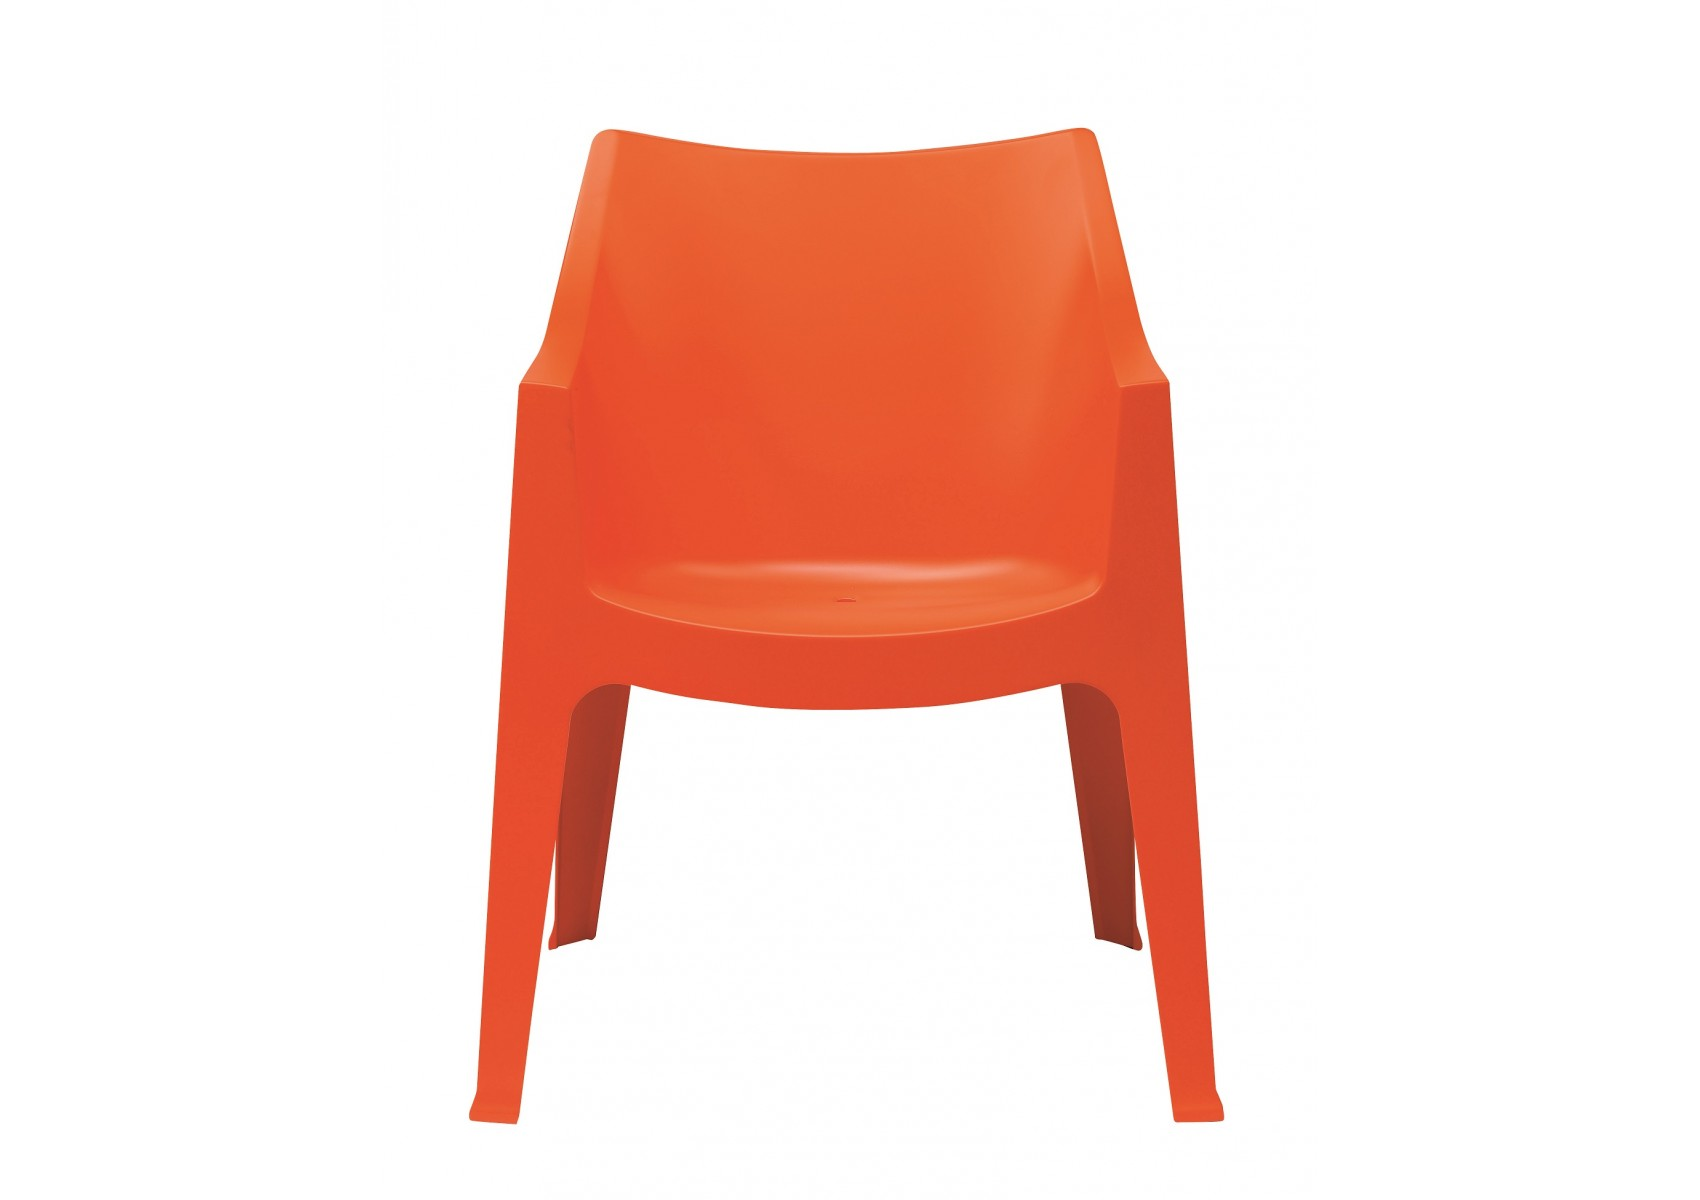 2 fauteuils design de jardin coccolona lot de 2 deco. Black Bedroom Furniture Sets. Home Design Ideas